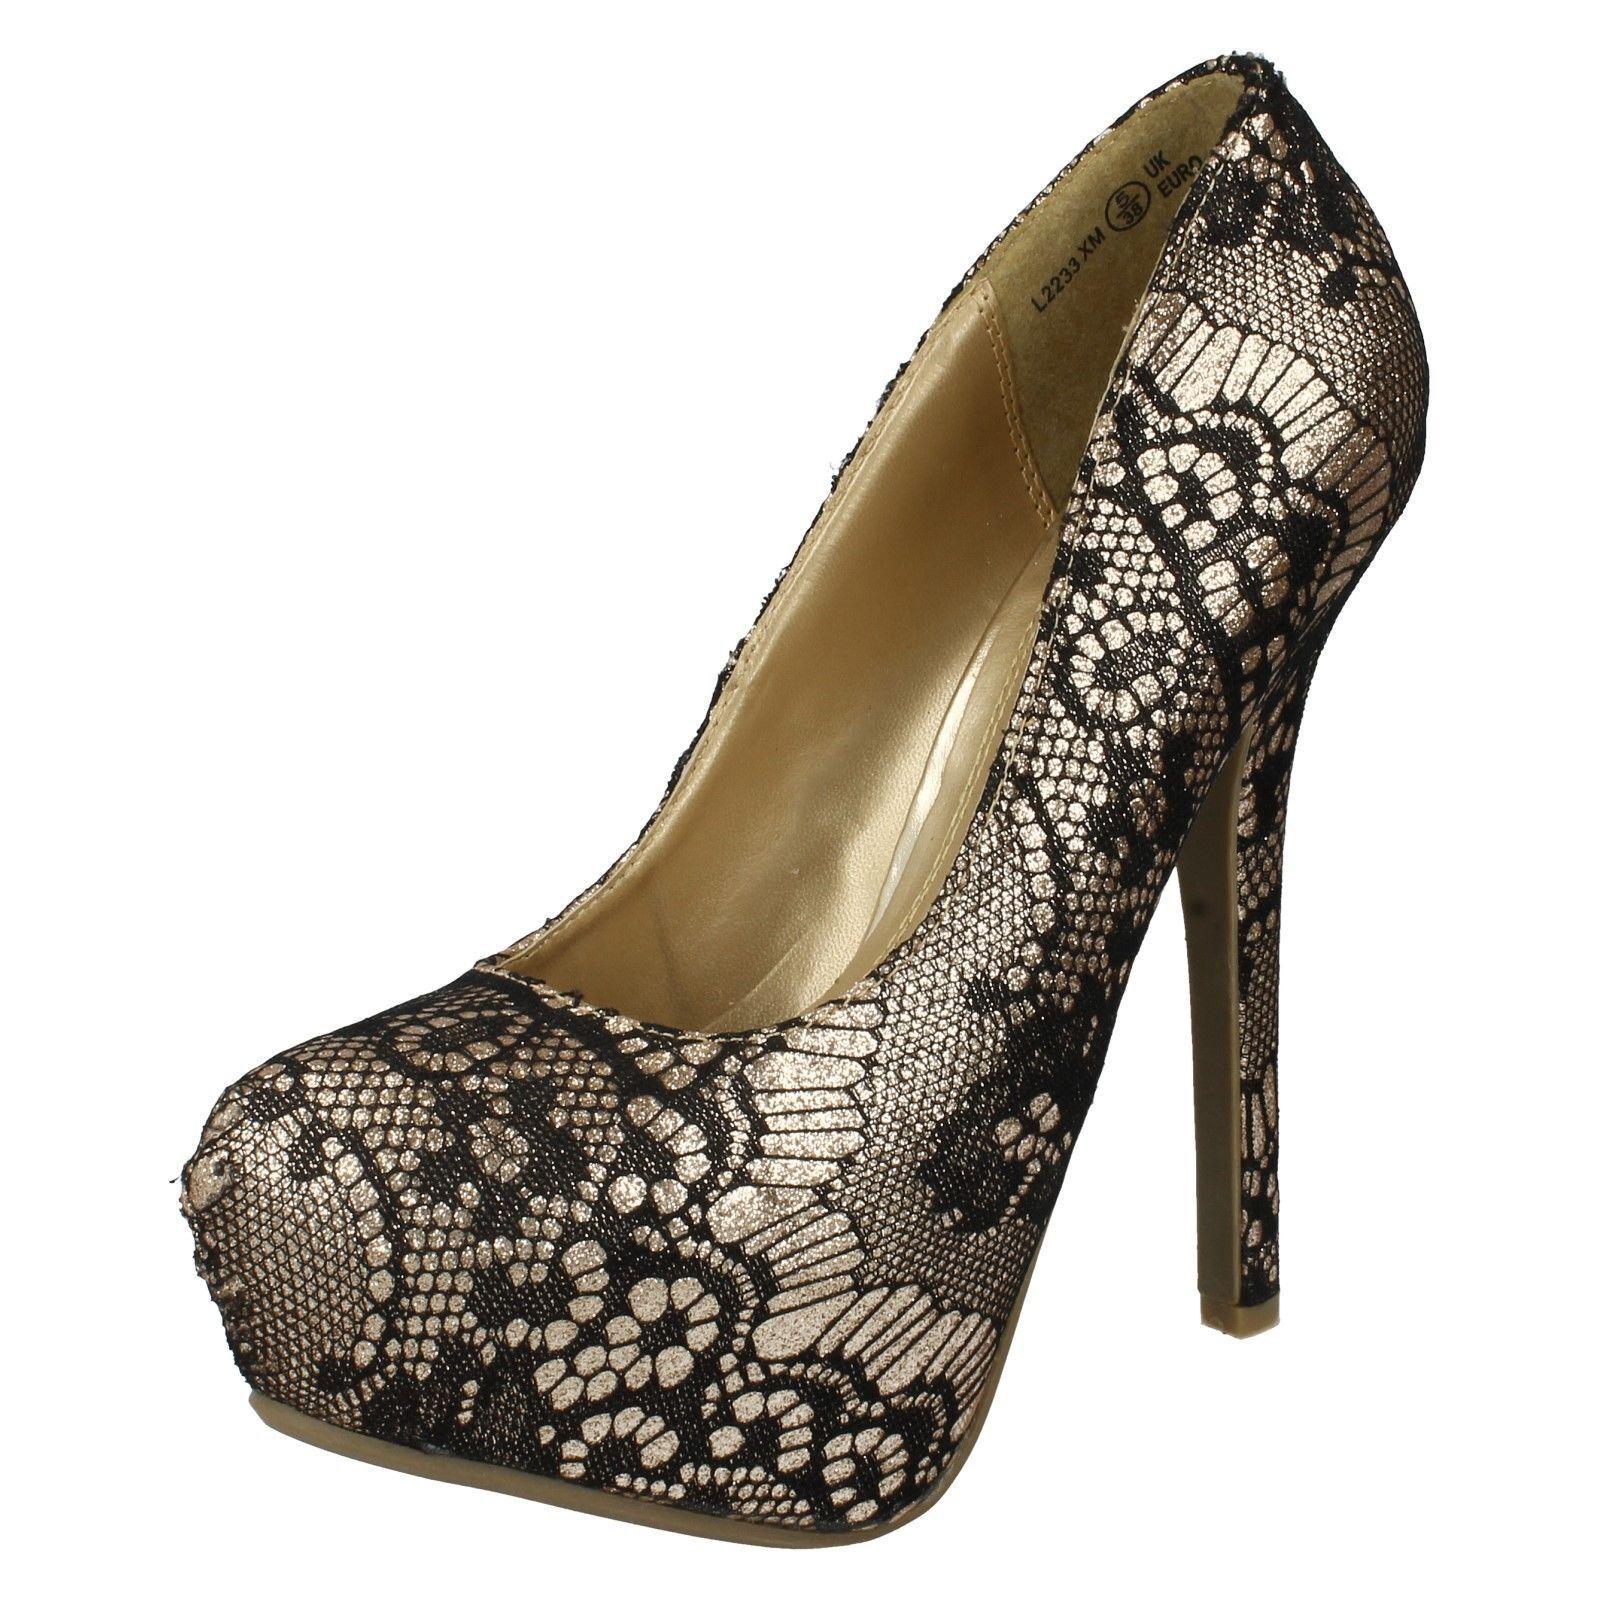 Moda jest prosta i niedroga Mujer Anne Michelle l2r233 Plataforma Tacón Alto Encaje Purpurina Zapatos de